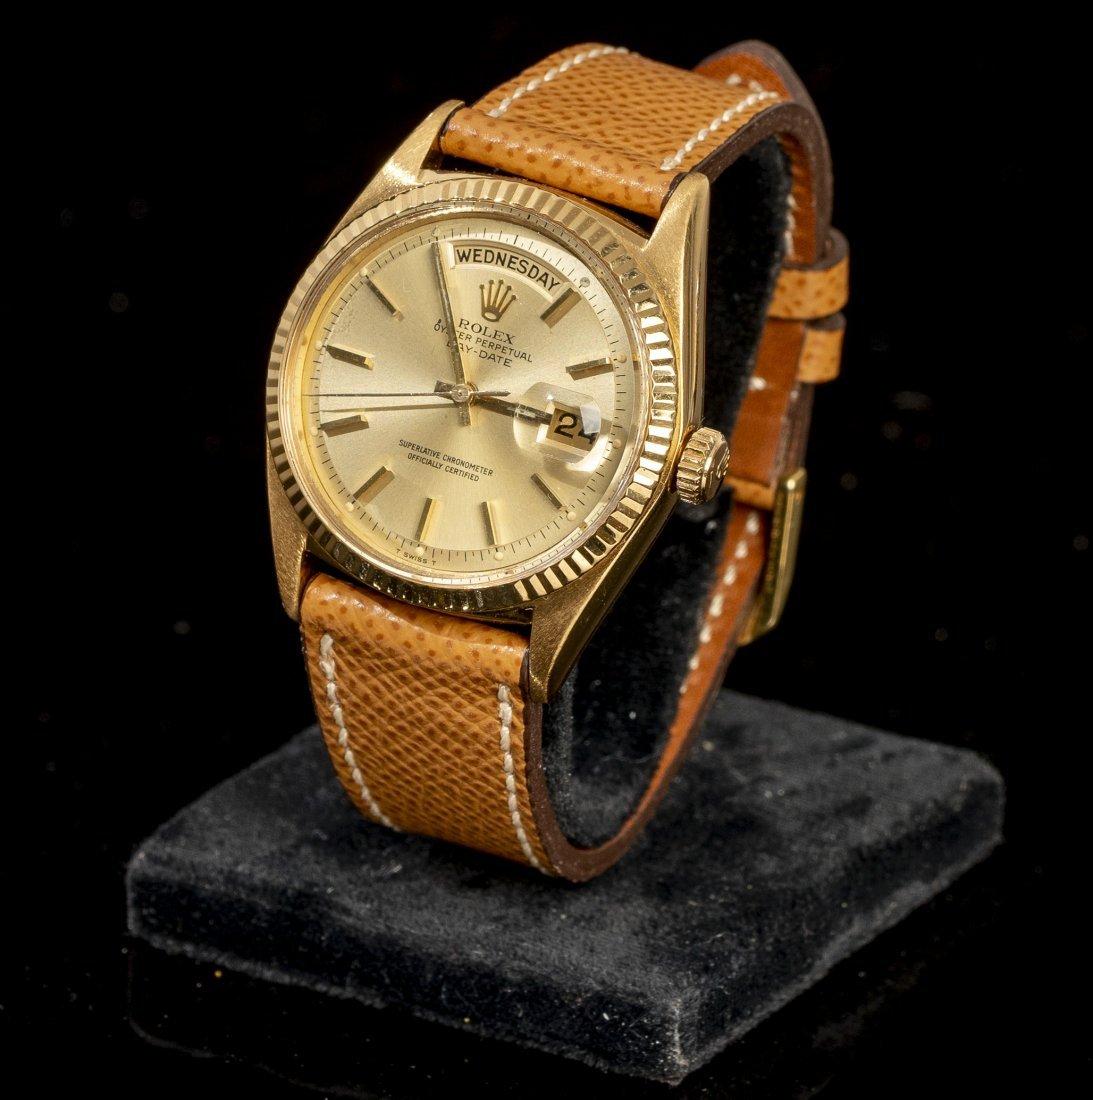 18k Gold Rolex President Model 1803 Day-Date